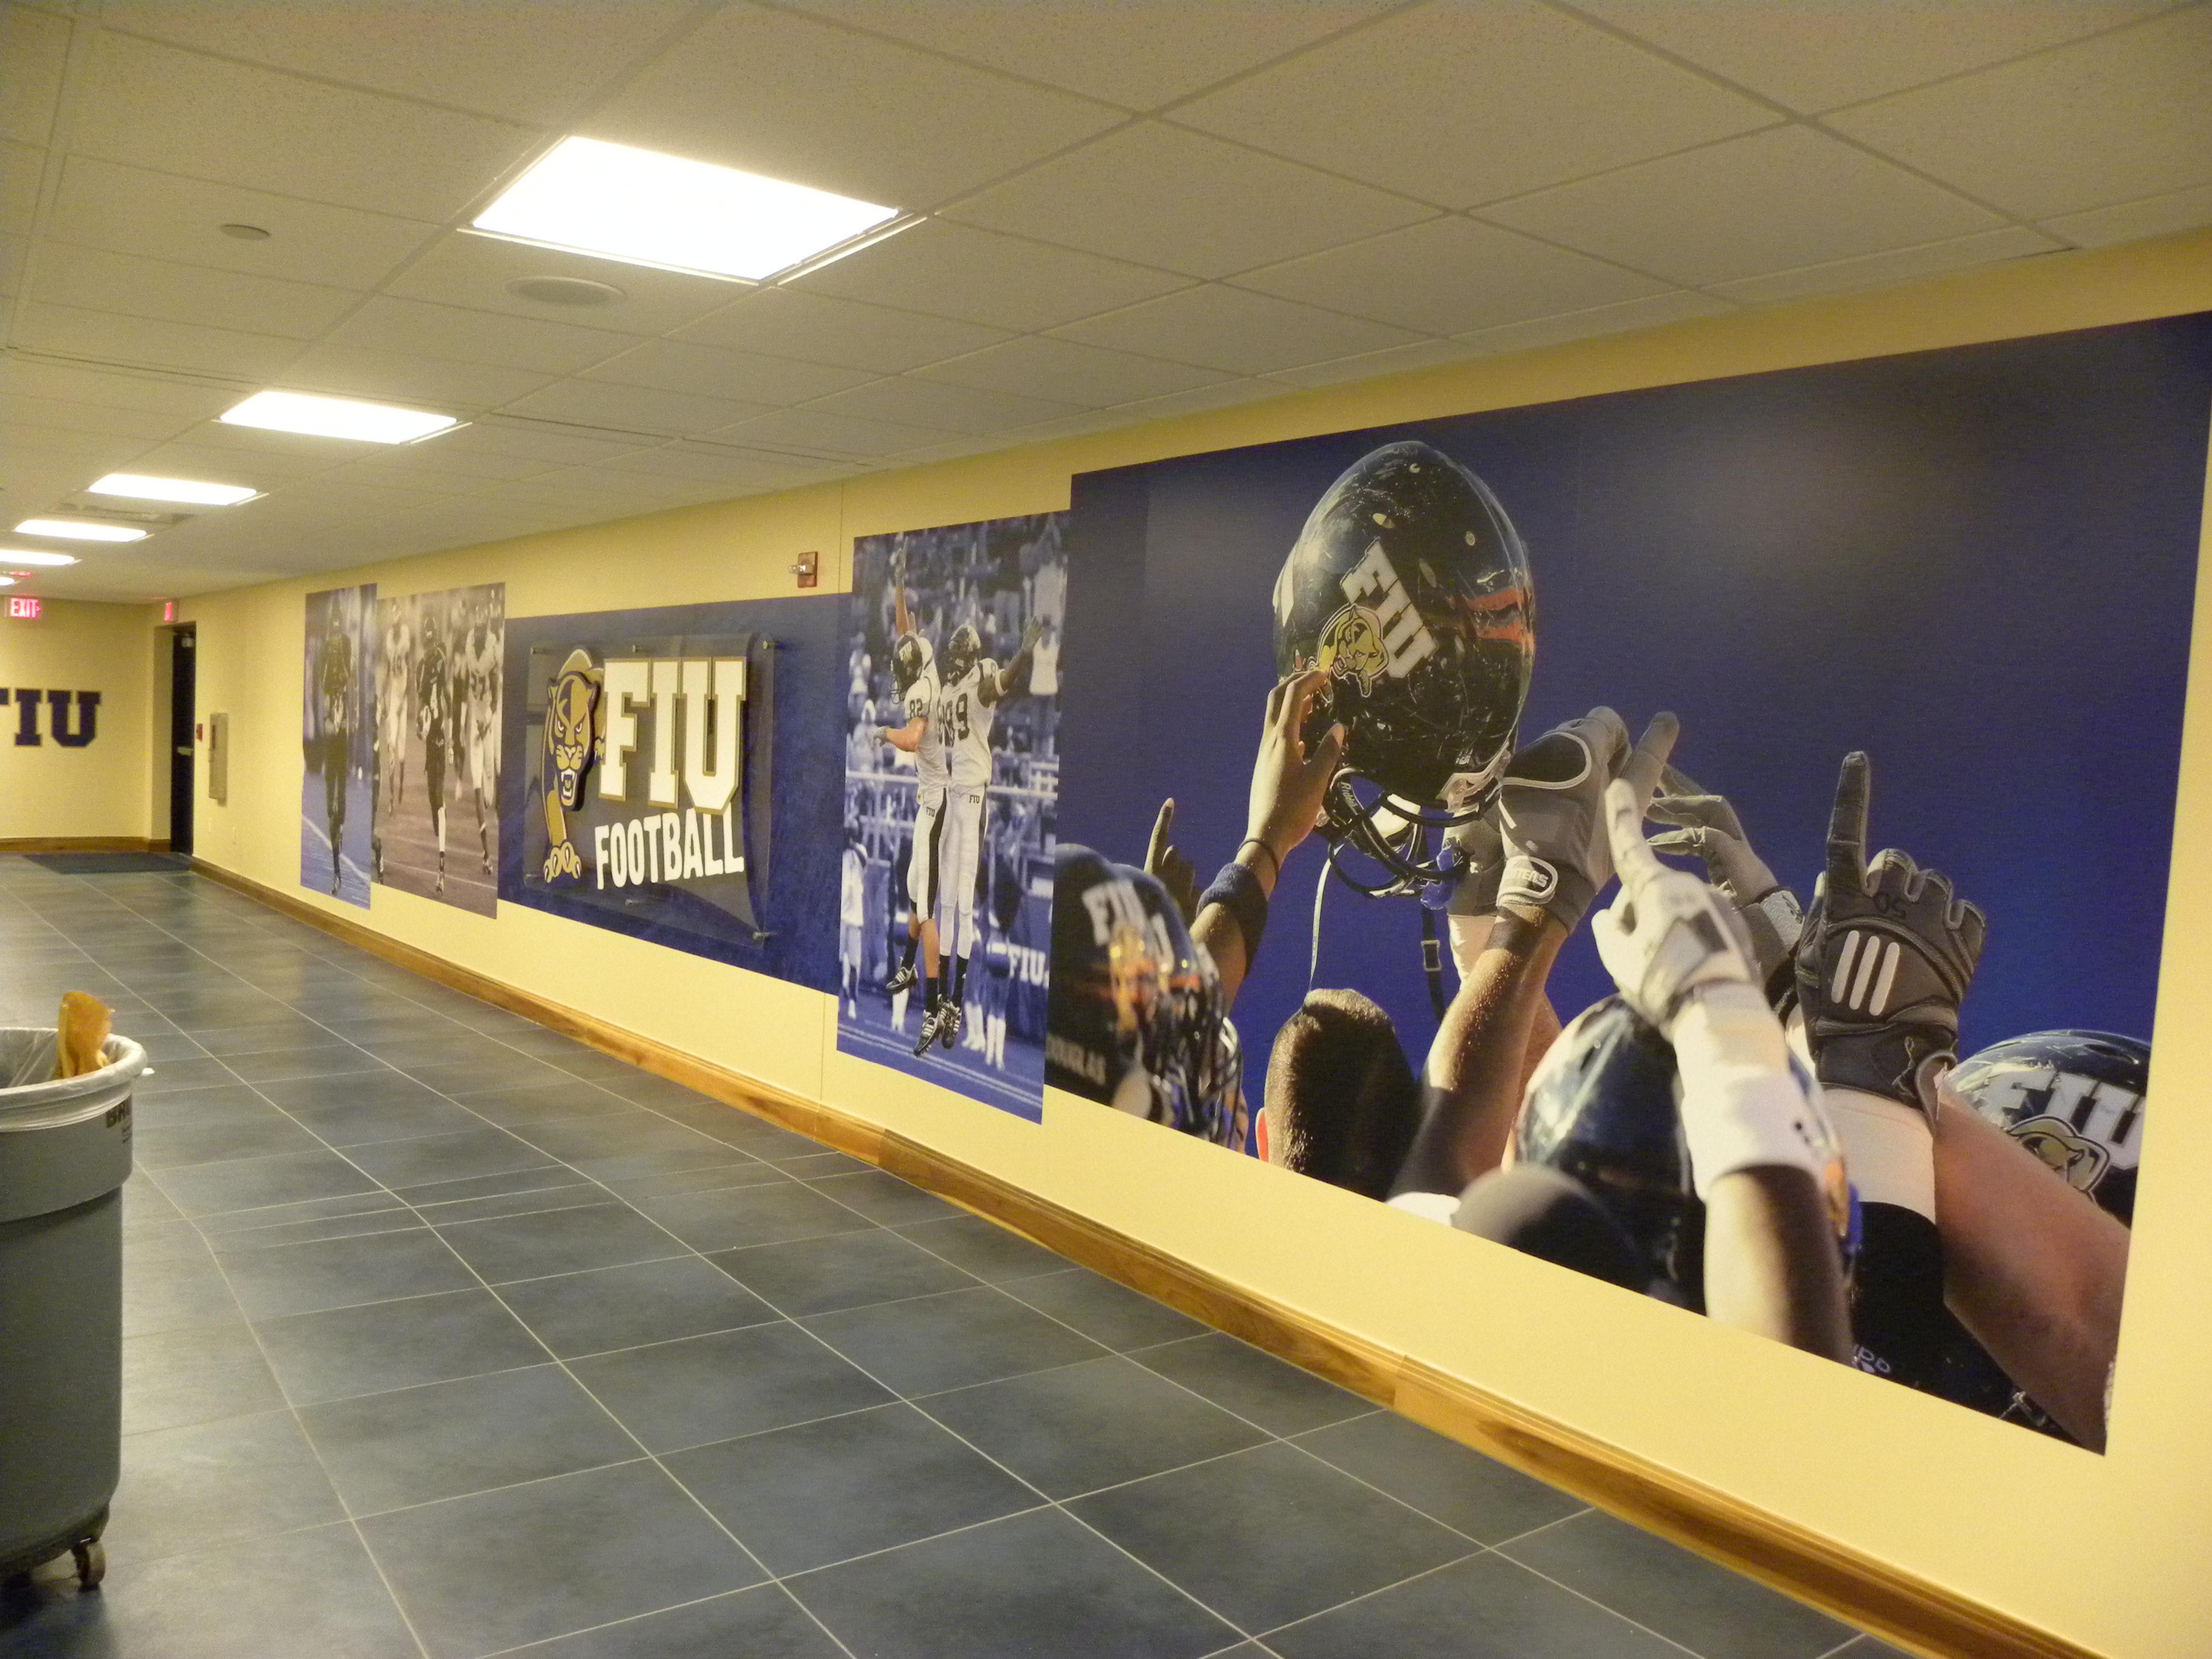 Sports Facility Wall Mural Designs By Oai Visual Branding